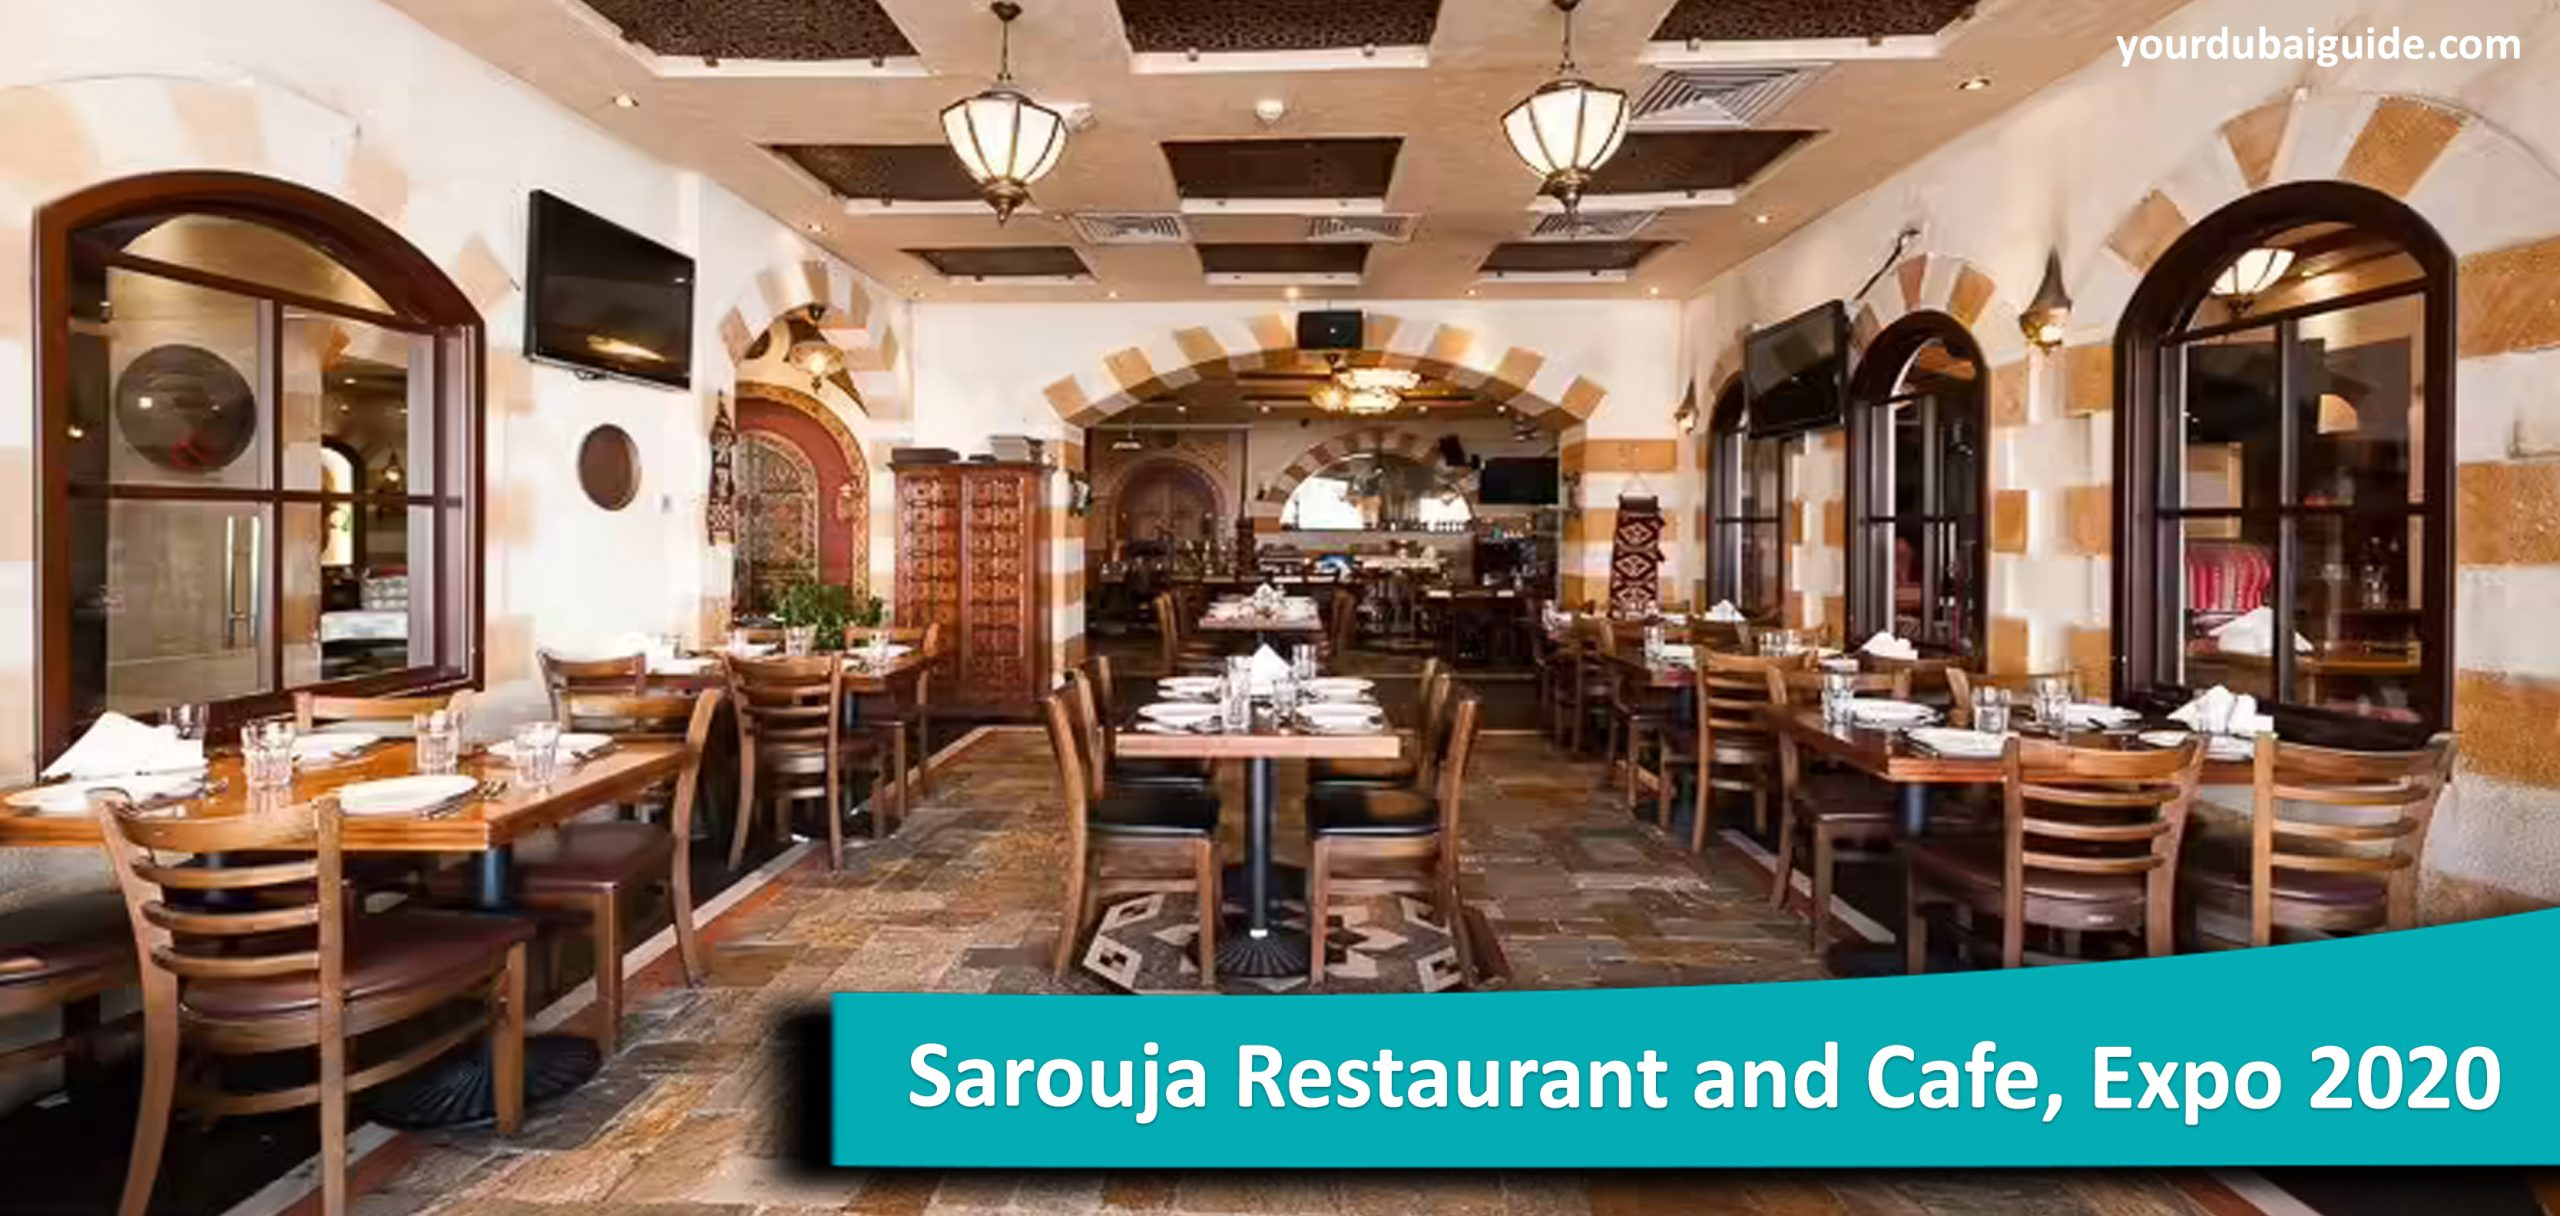 Sarouja Restaurant and Cafe at Expo 2020, Dubai